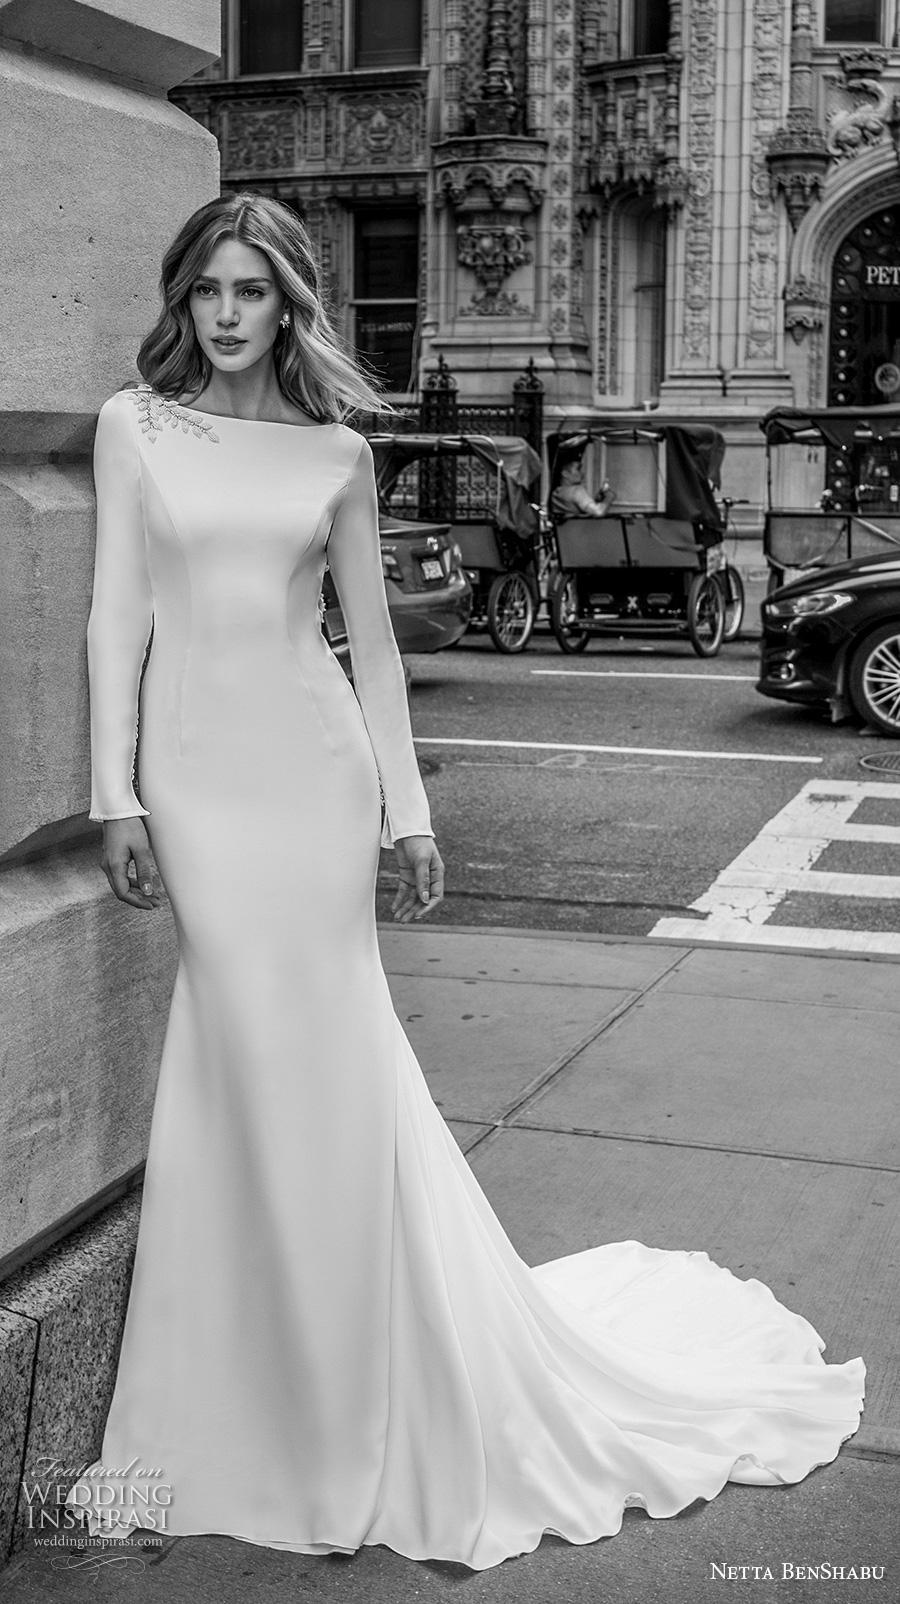 netta benshabu fall 2019 bridal long sleeves bateau neckline simple minimalist clean elegant fit and flare wedding dress low backless open back chapel train (13) mv